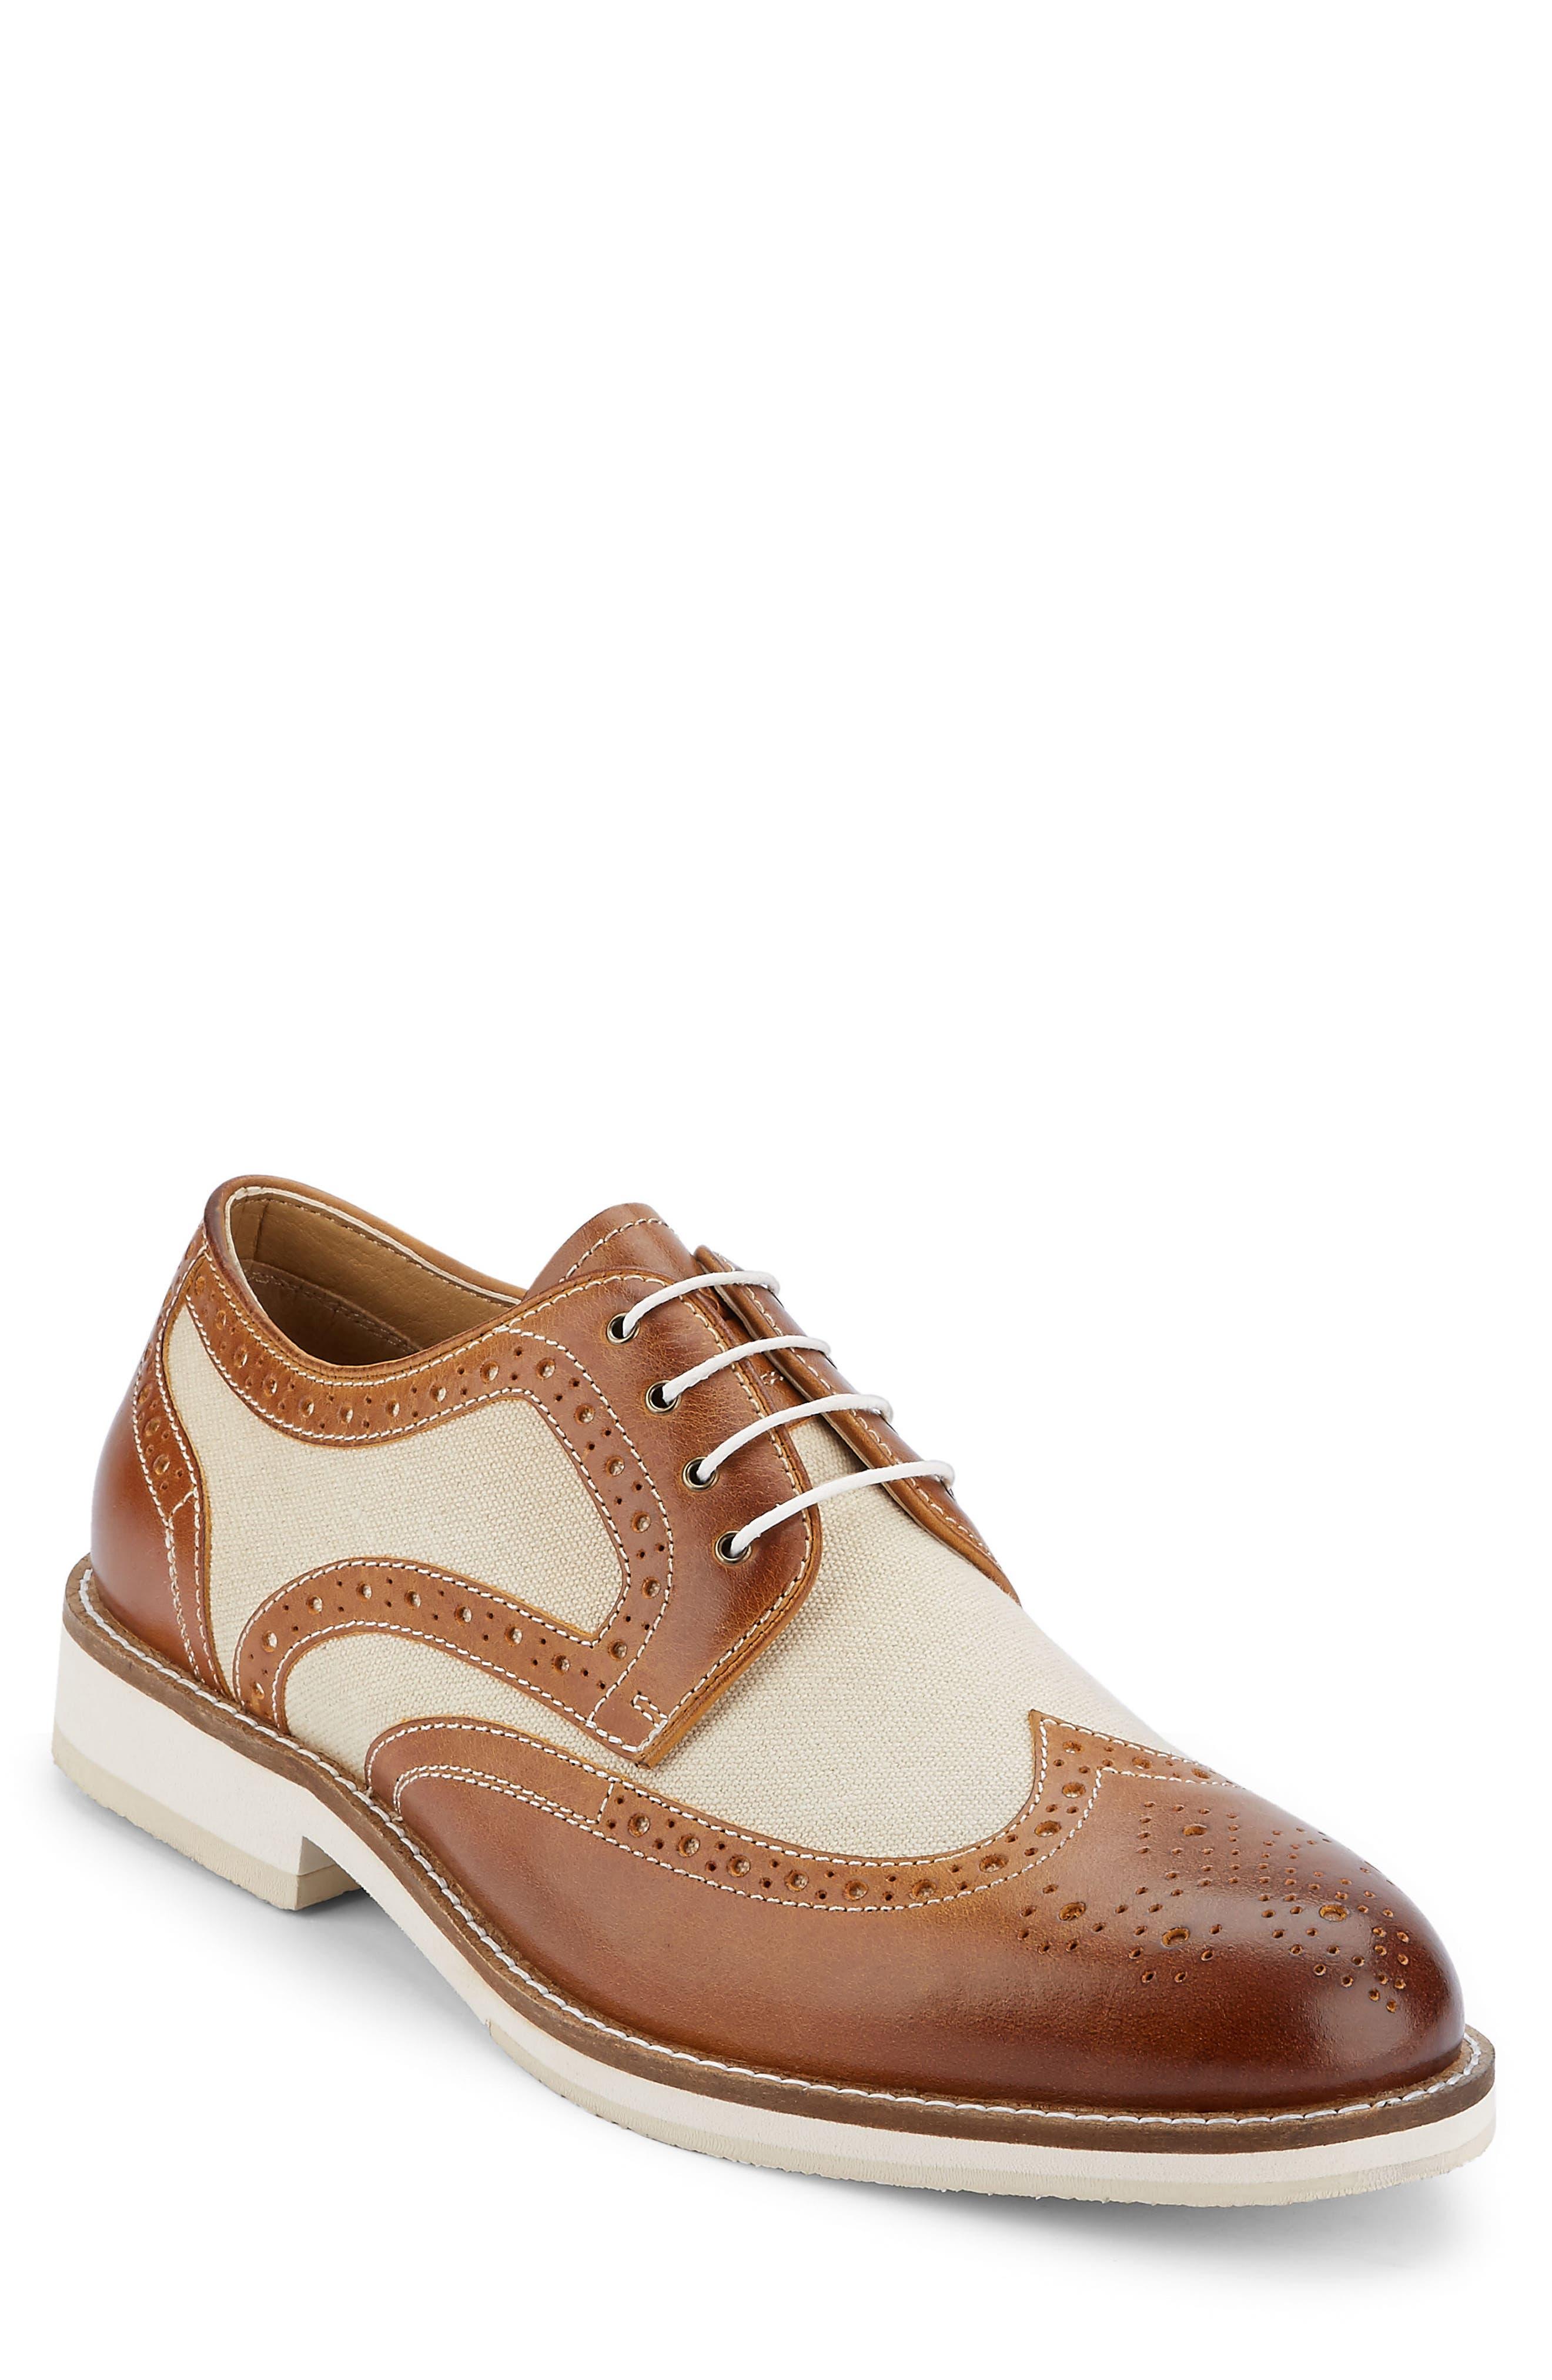 Main Image - G.H. Bass & Co. Norman Spectator Shoe (Men)